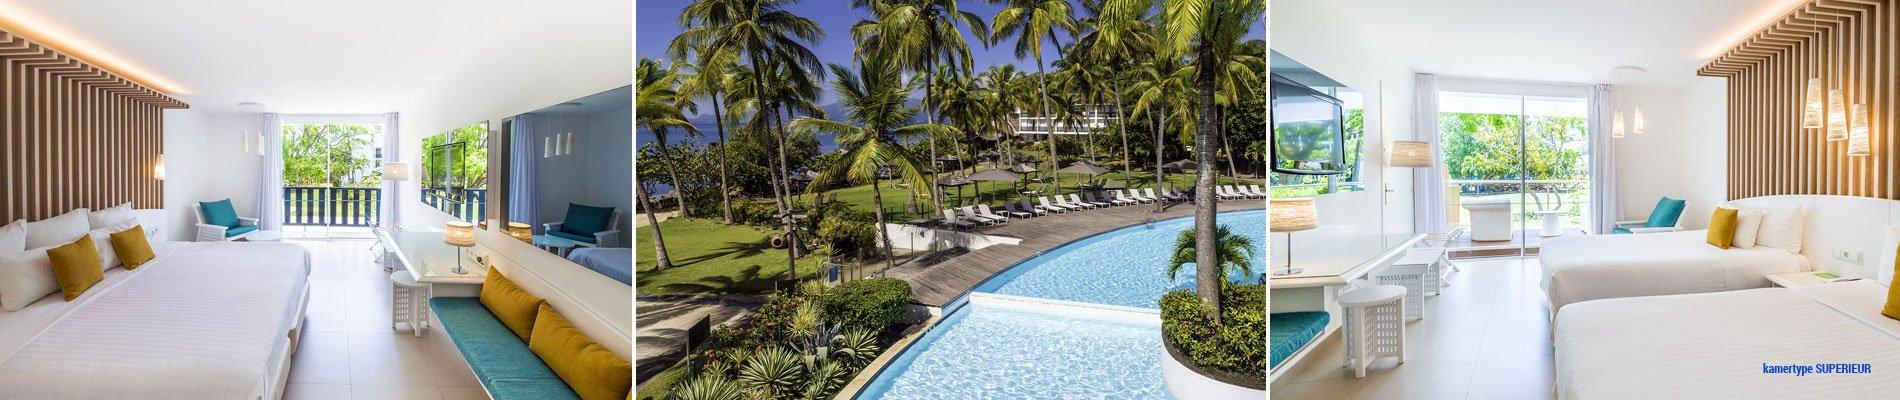 creole-beach-guadeloupe-tropisch-frankrijk